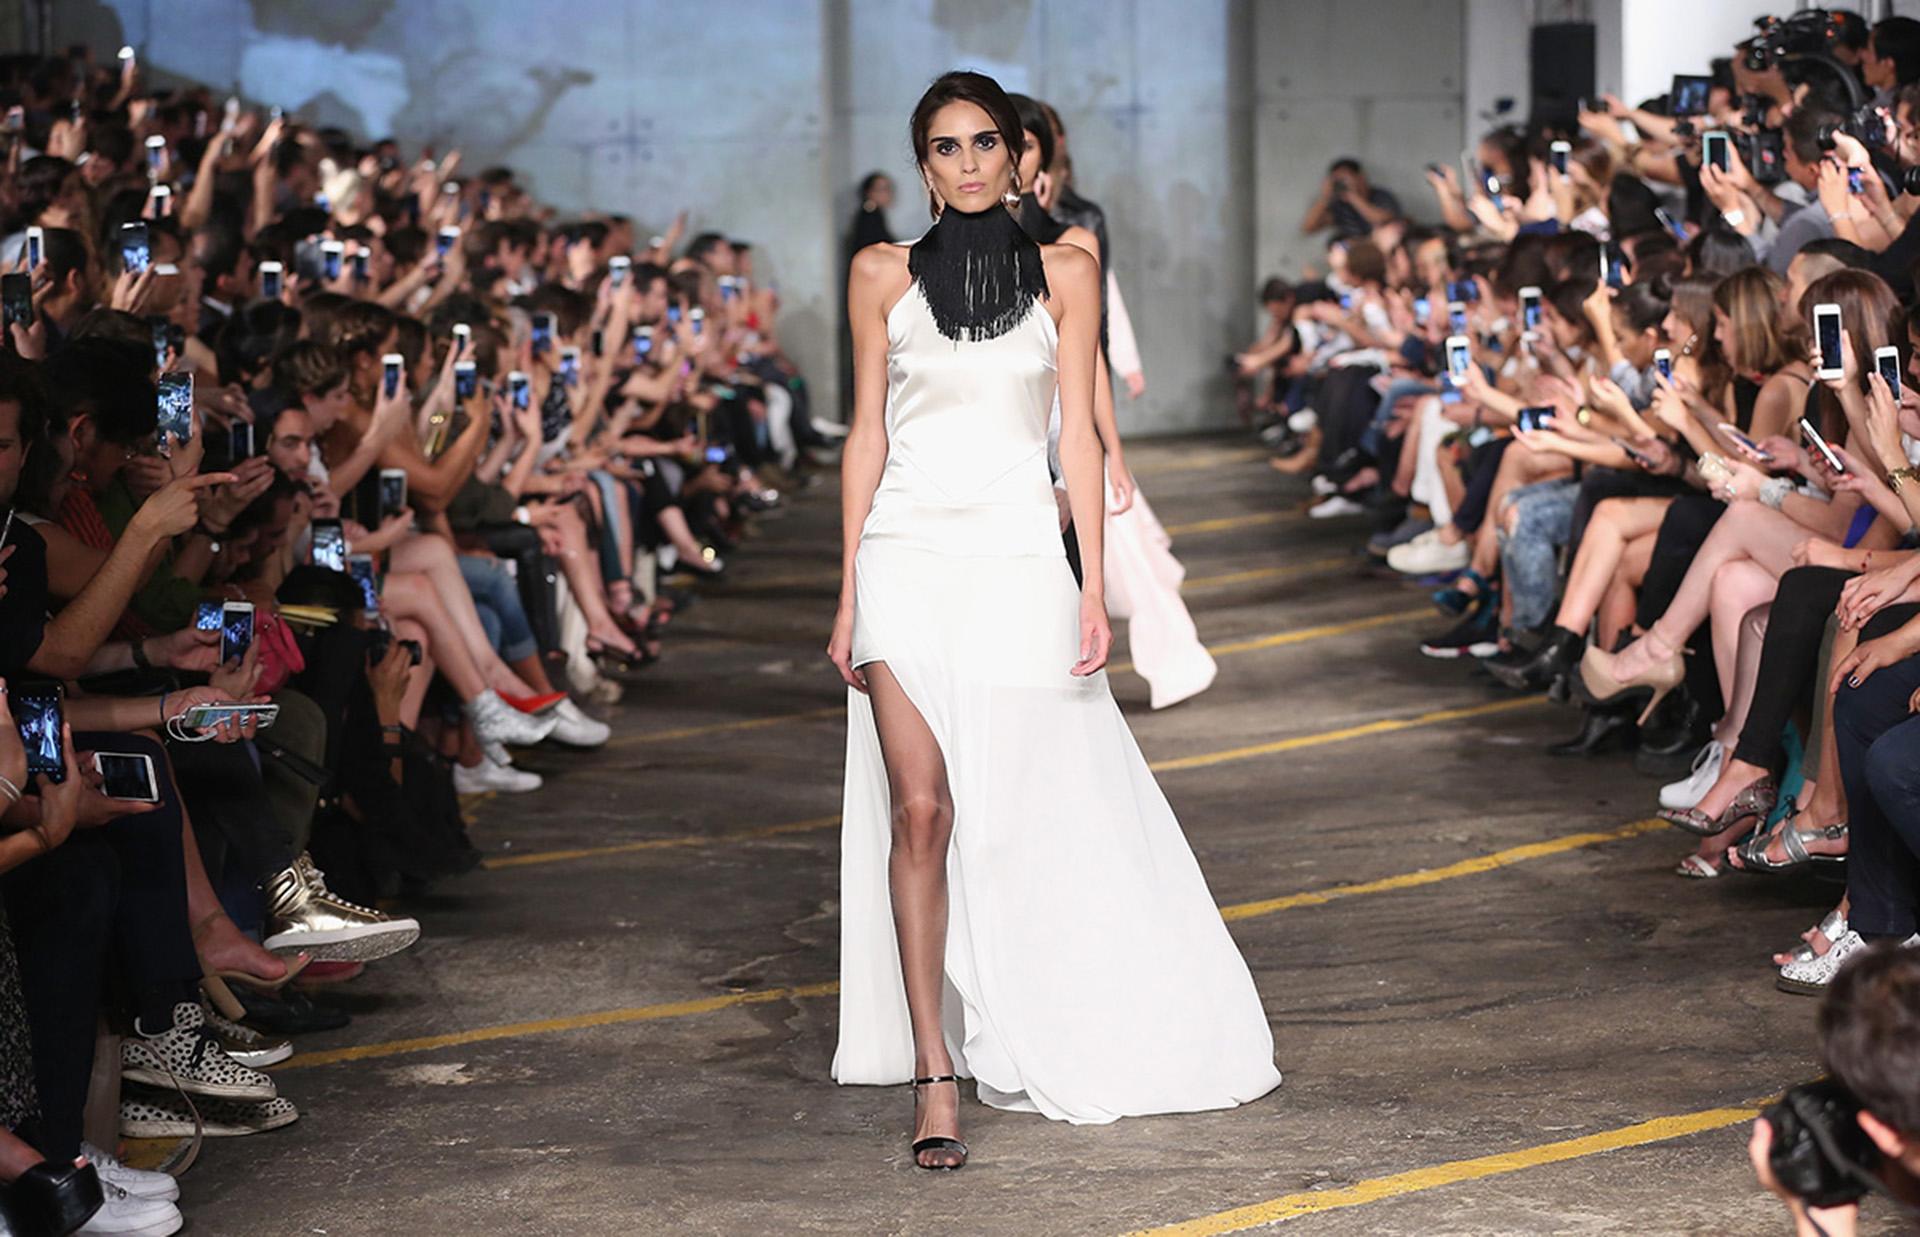 Todos los detalles de #FashionWeekMX 2018